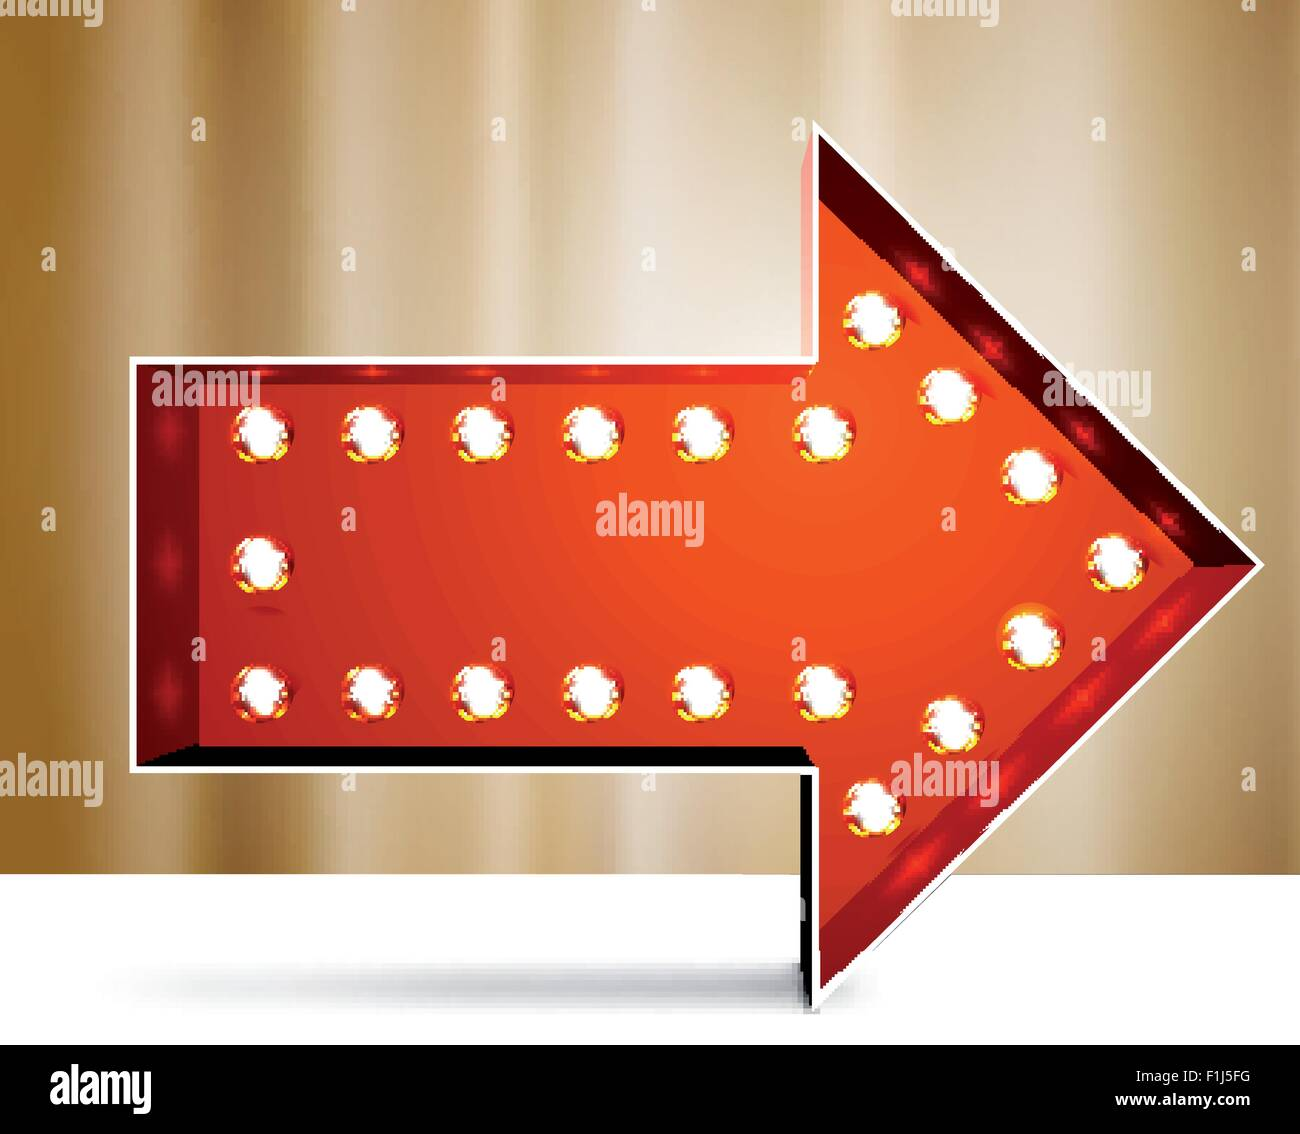 Símbolo de flecha marquesina vectorial Imagen De Stock